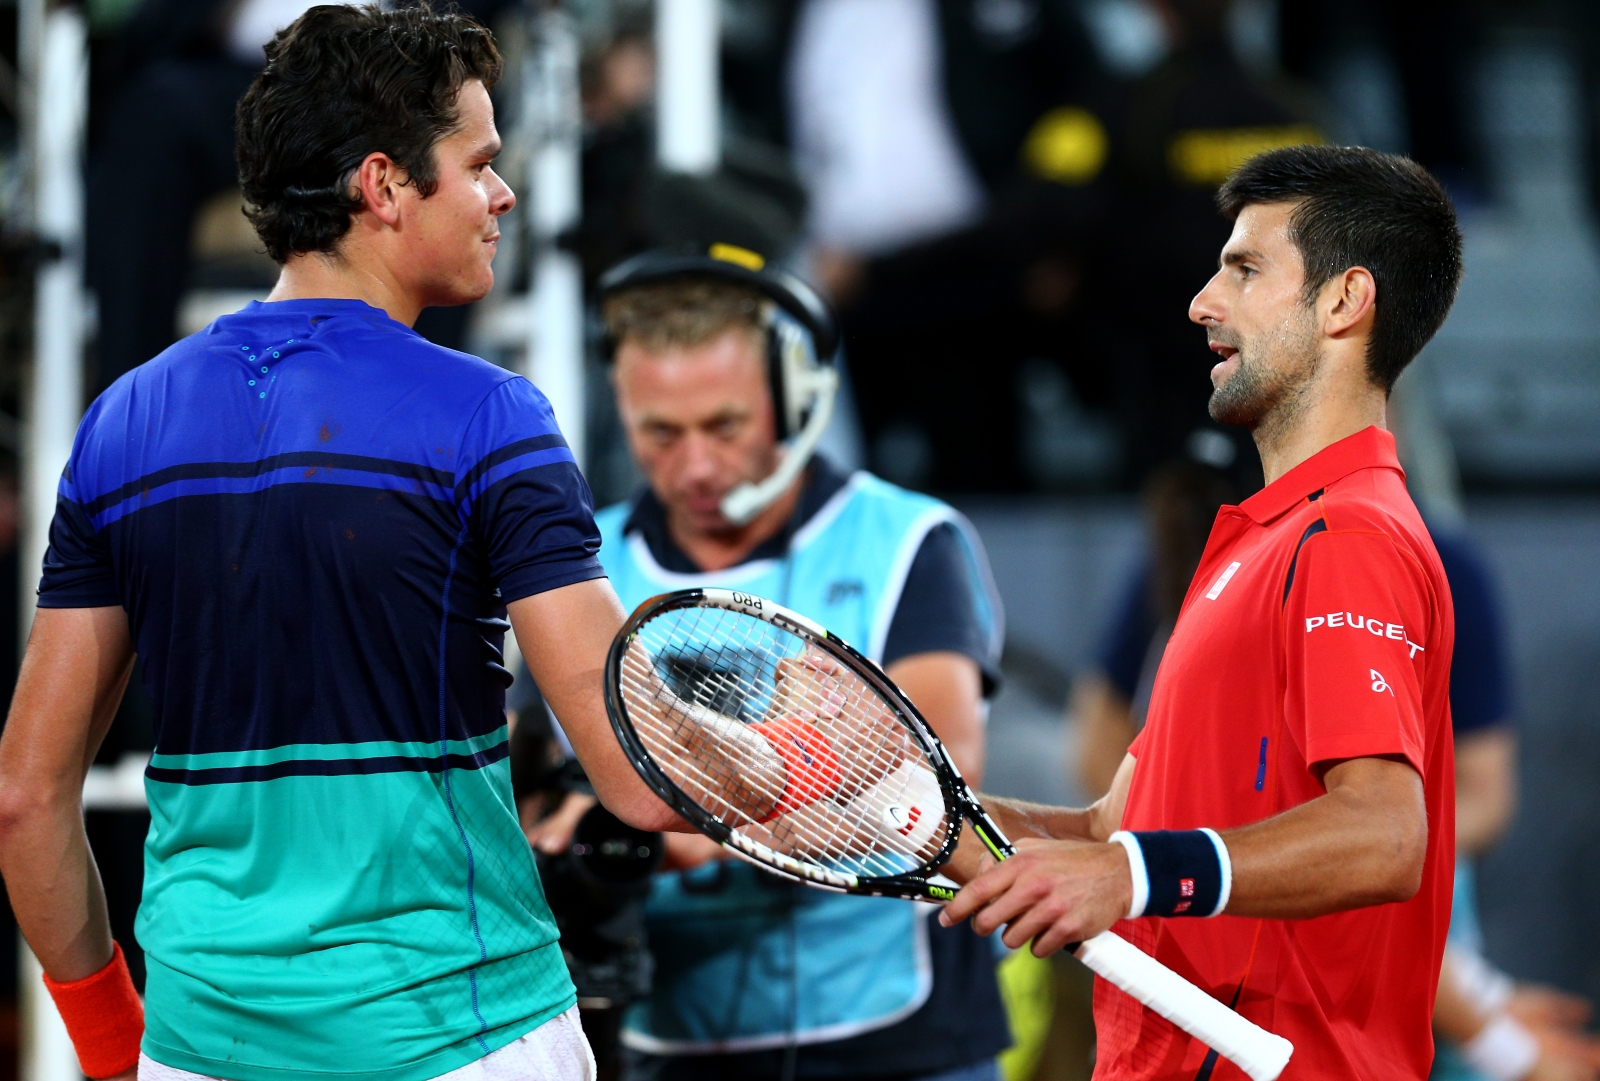 Milos Raonic and Novak Djokovic